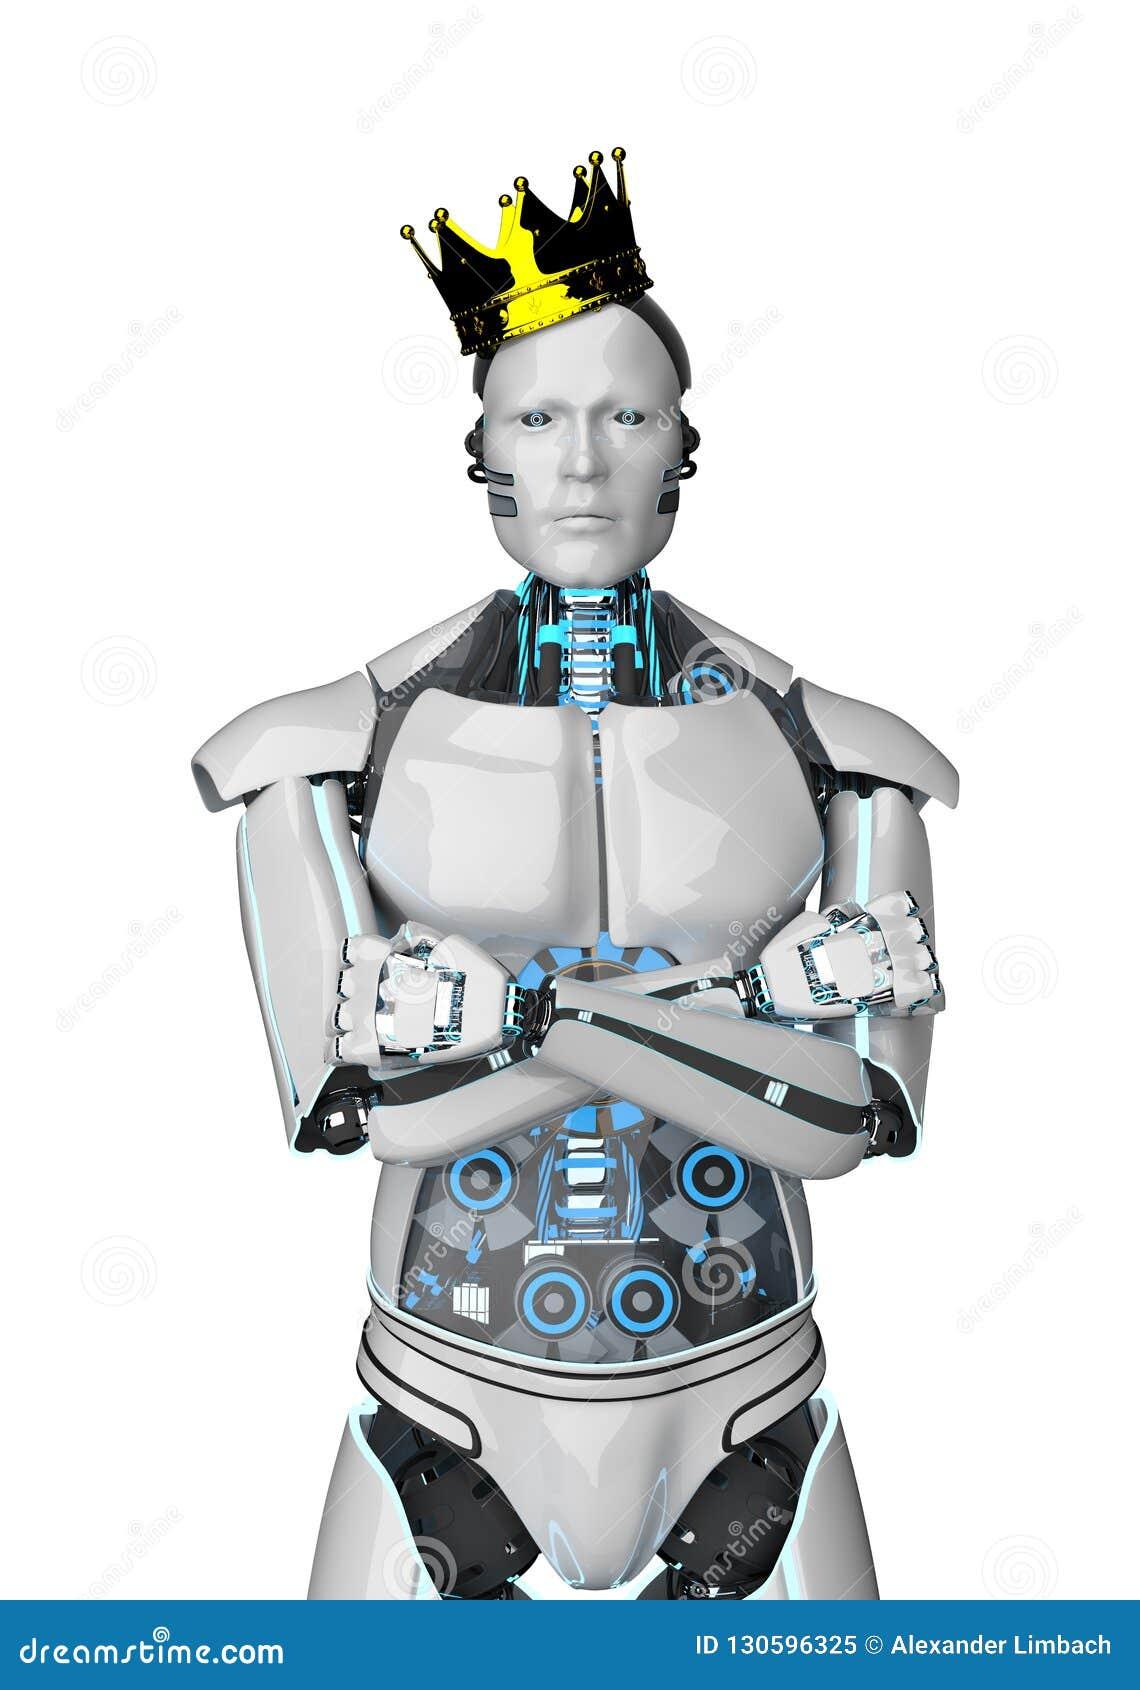 Robot golden crown